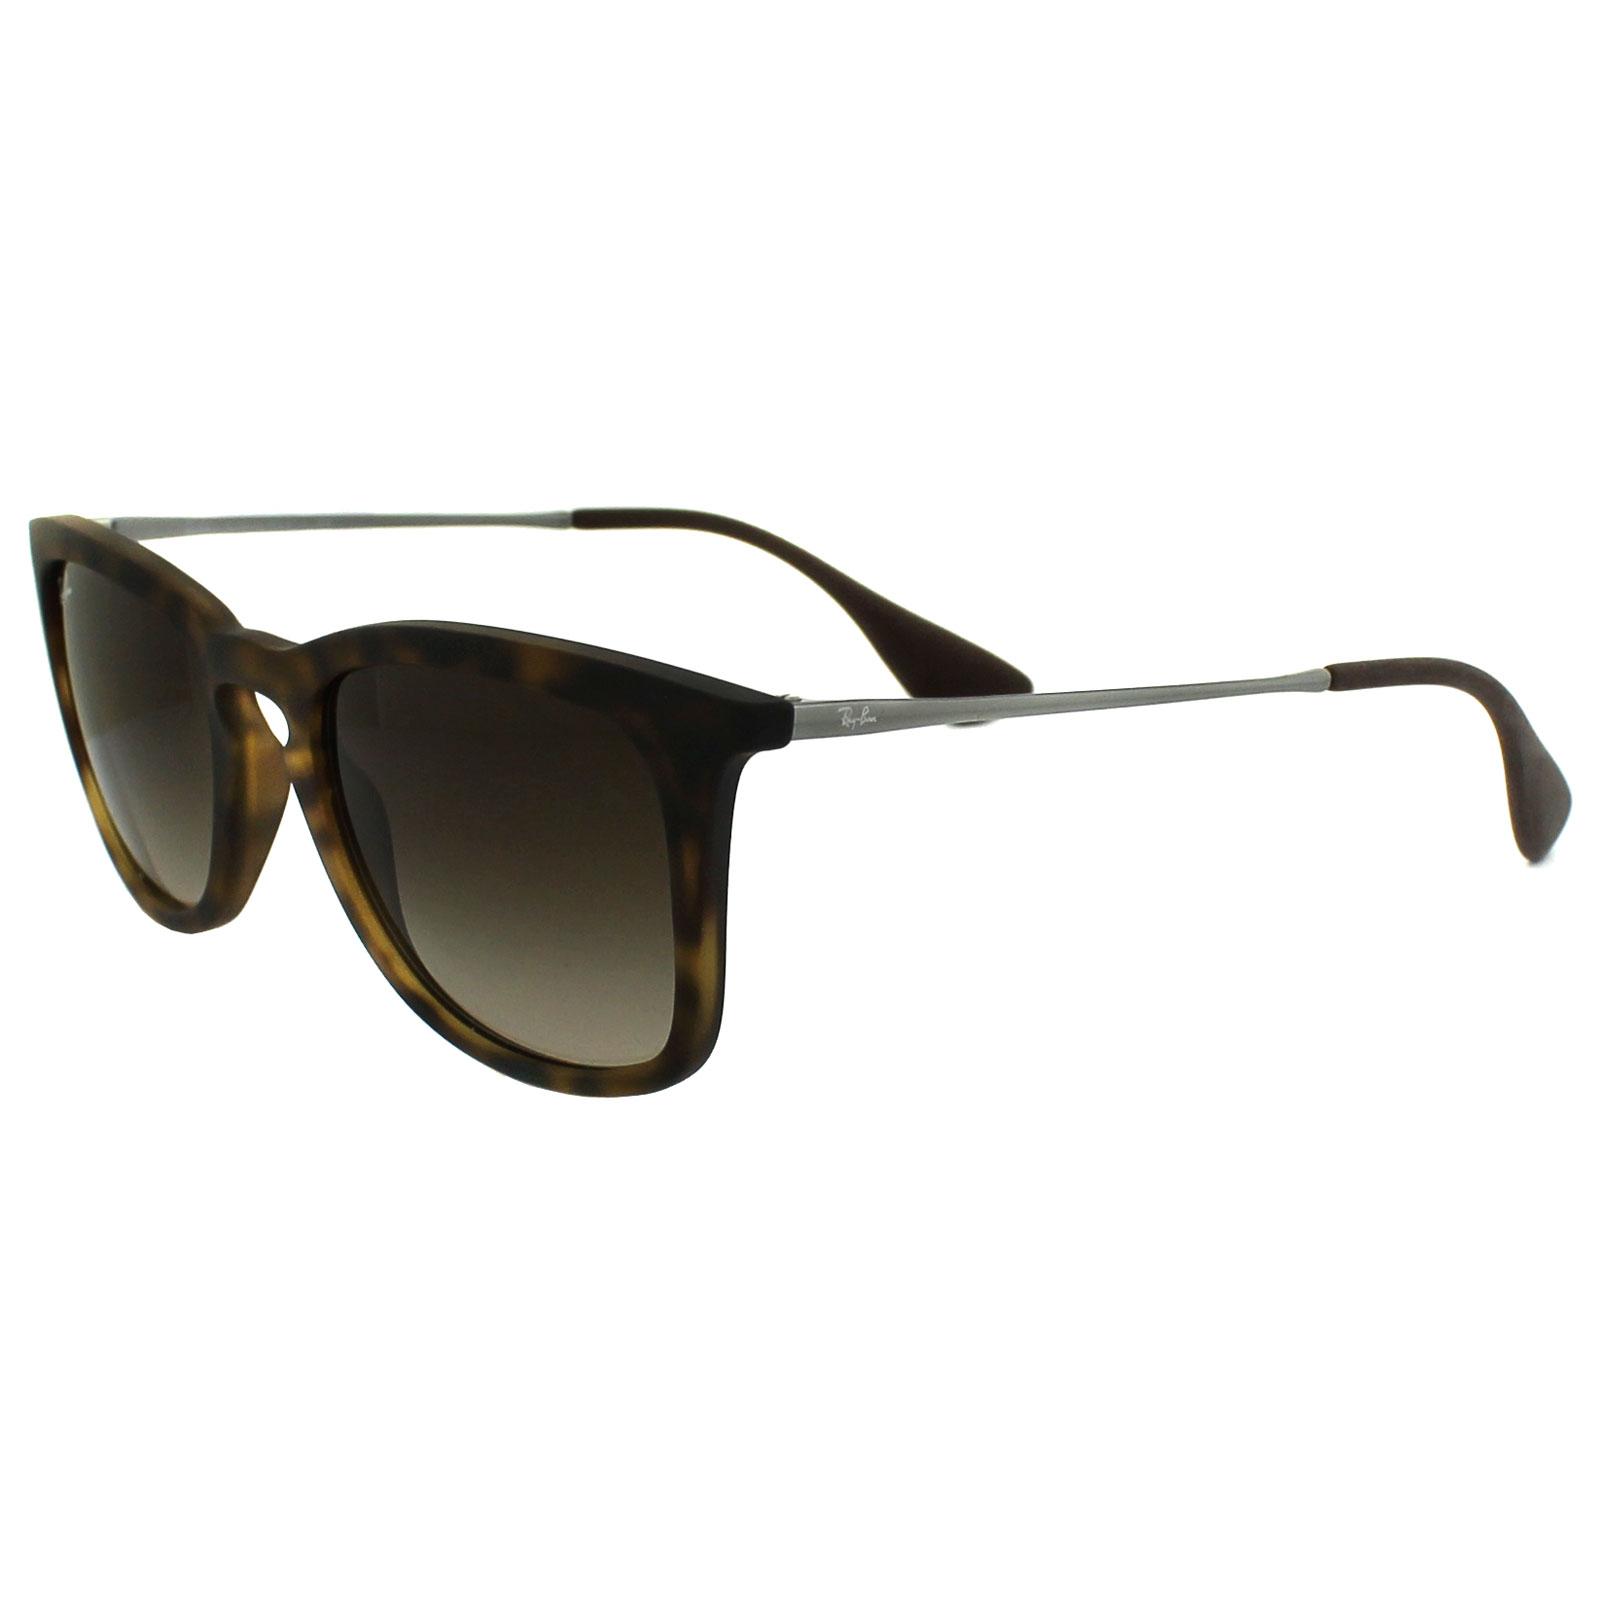 Ray ban sunglasses gradient - Ray Ban Sunglasses Gradient 58